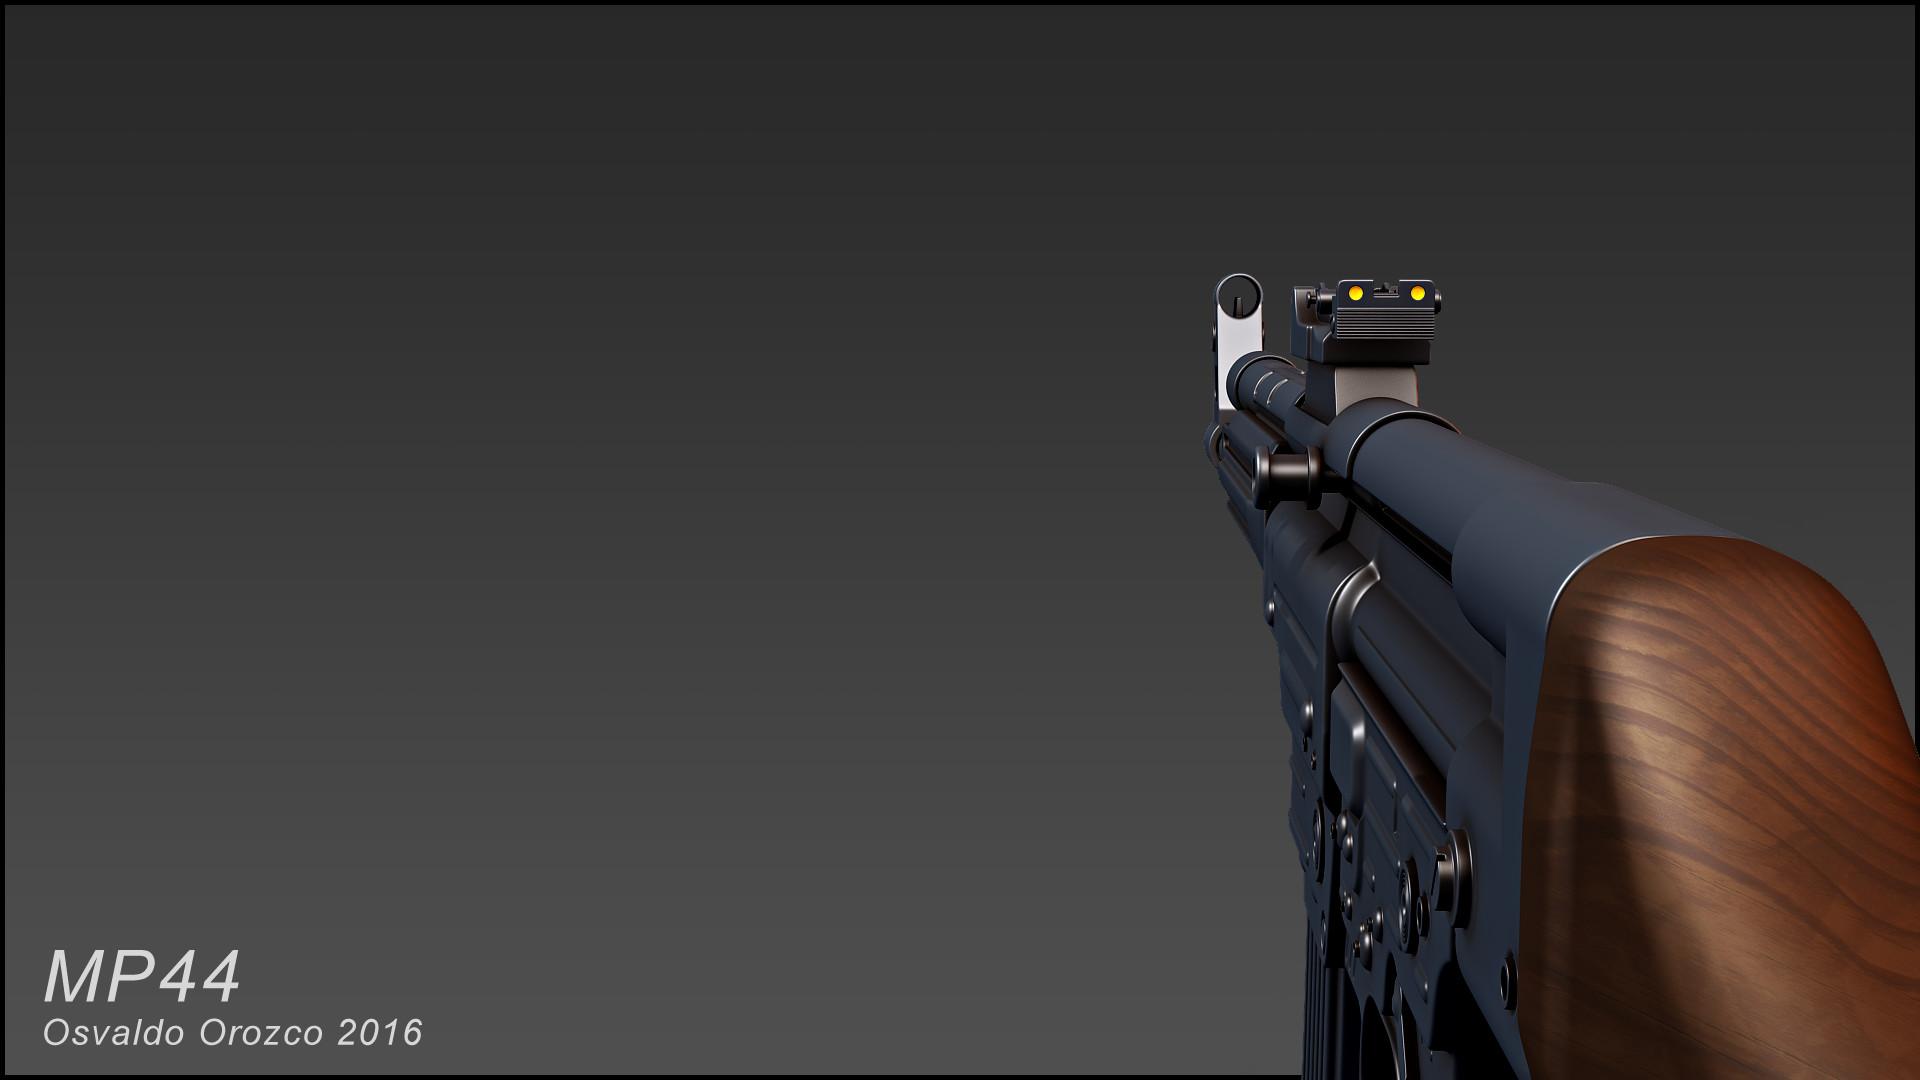 The edge style mp44 2